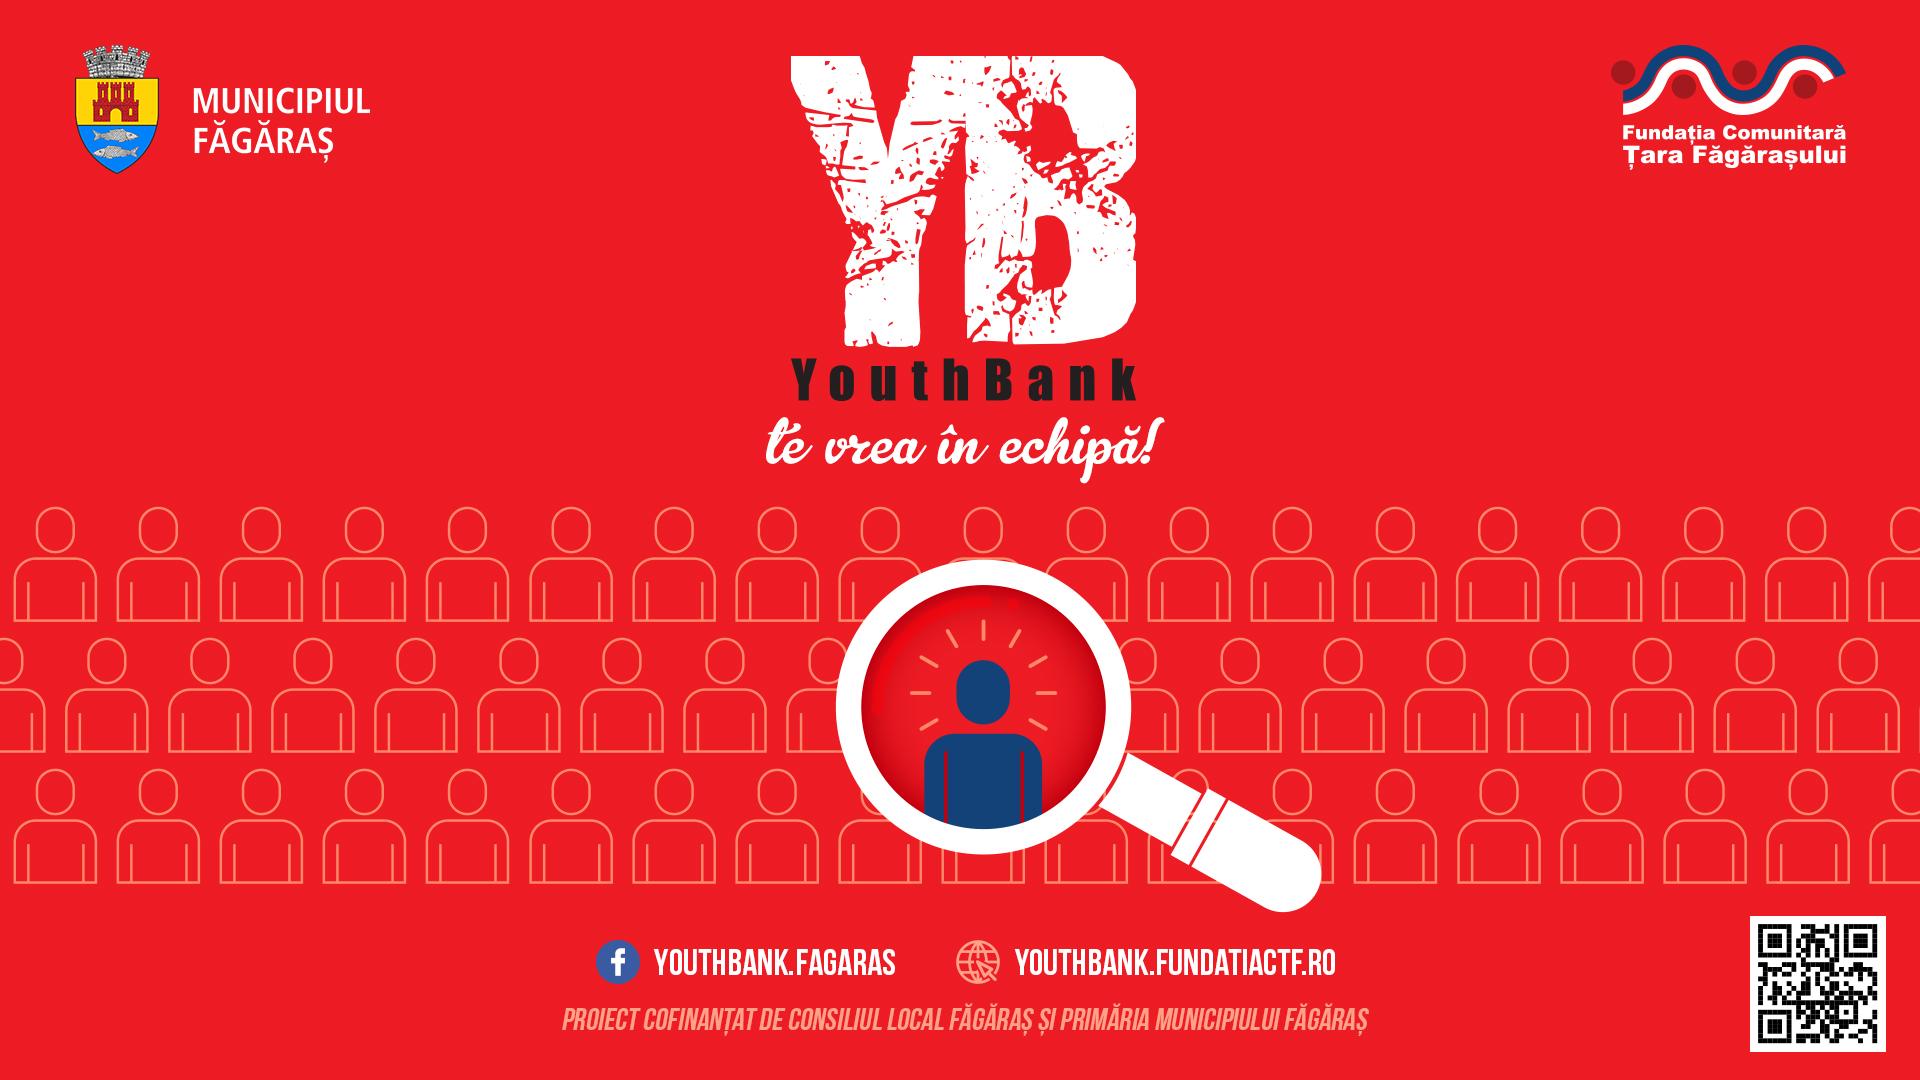 Permalink to: Hai în echipa YouthBank!